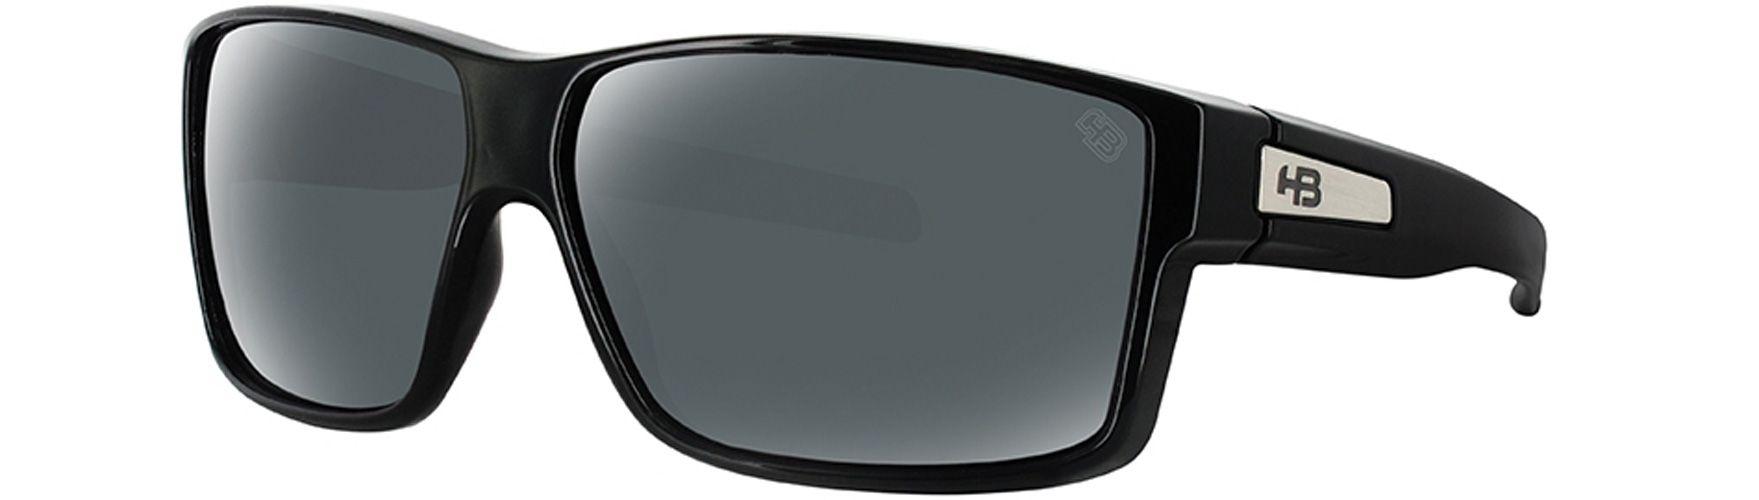 Óculos HB Big Vert